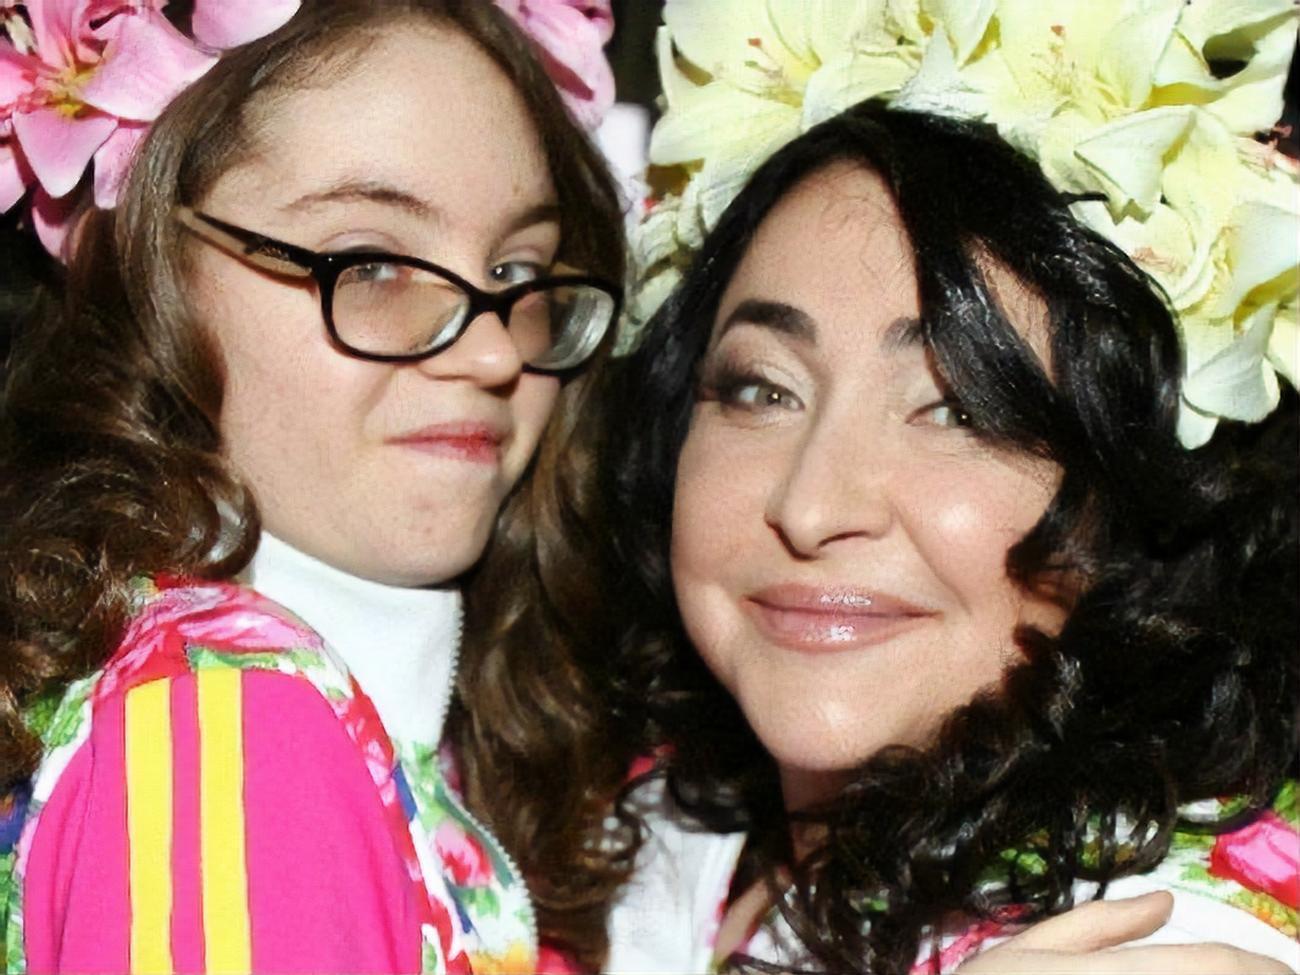 Лолита призналась, что у дочери не аутизм, а синдром Аспергера